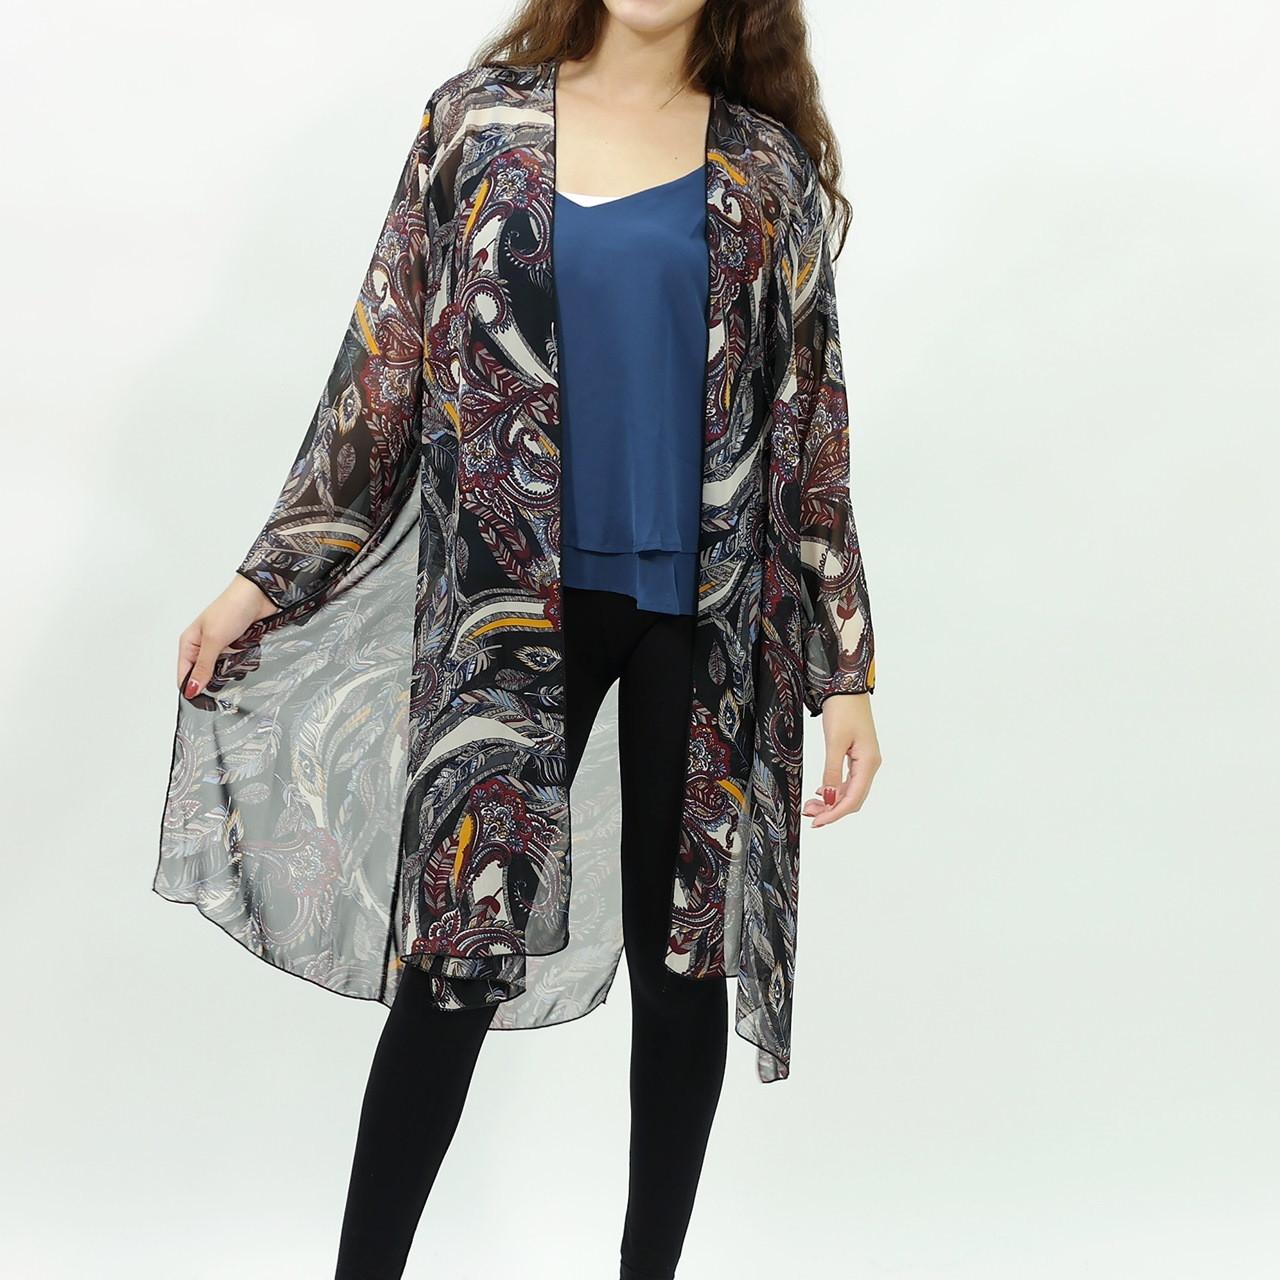 Feather inspired chiffon long kimono cardigan Black